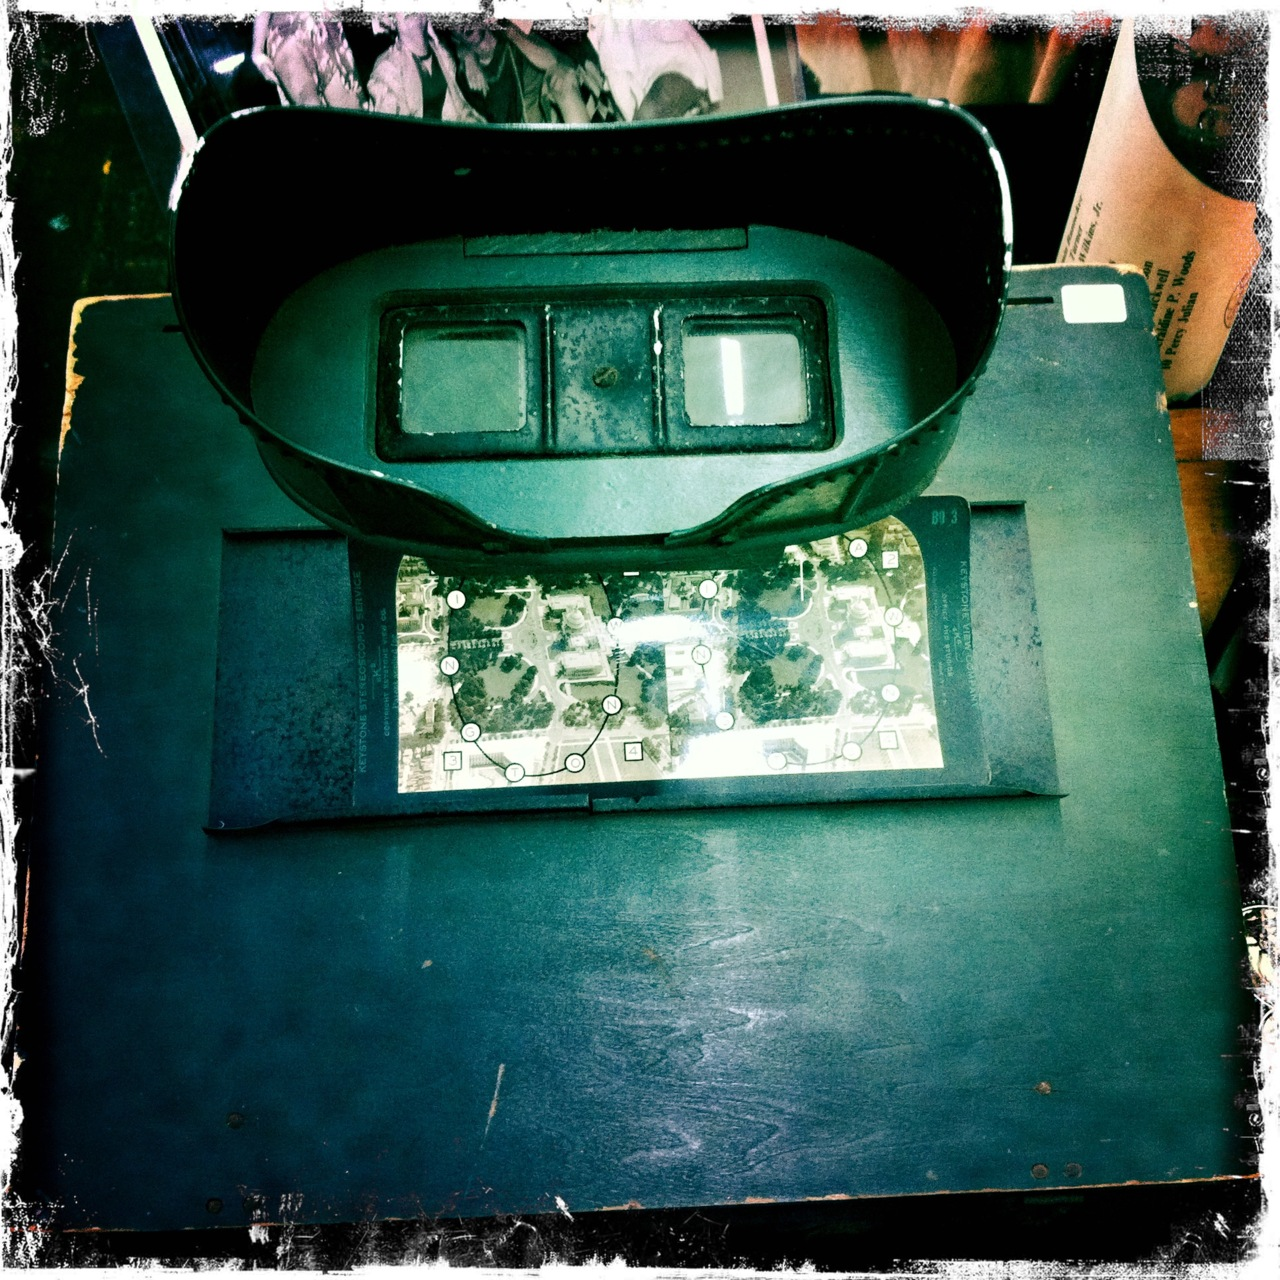 Stereoscope.